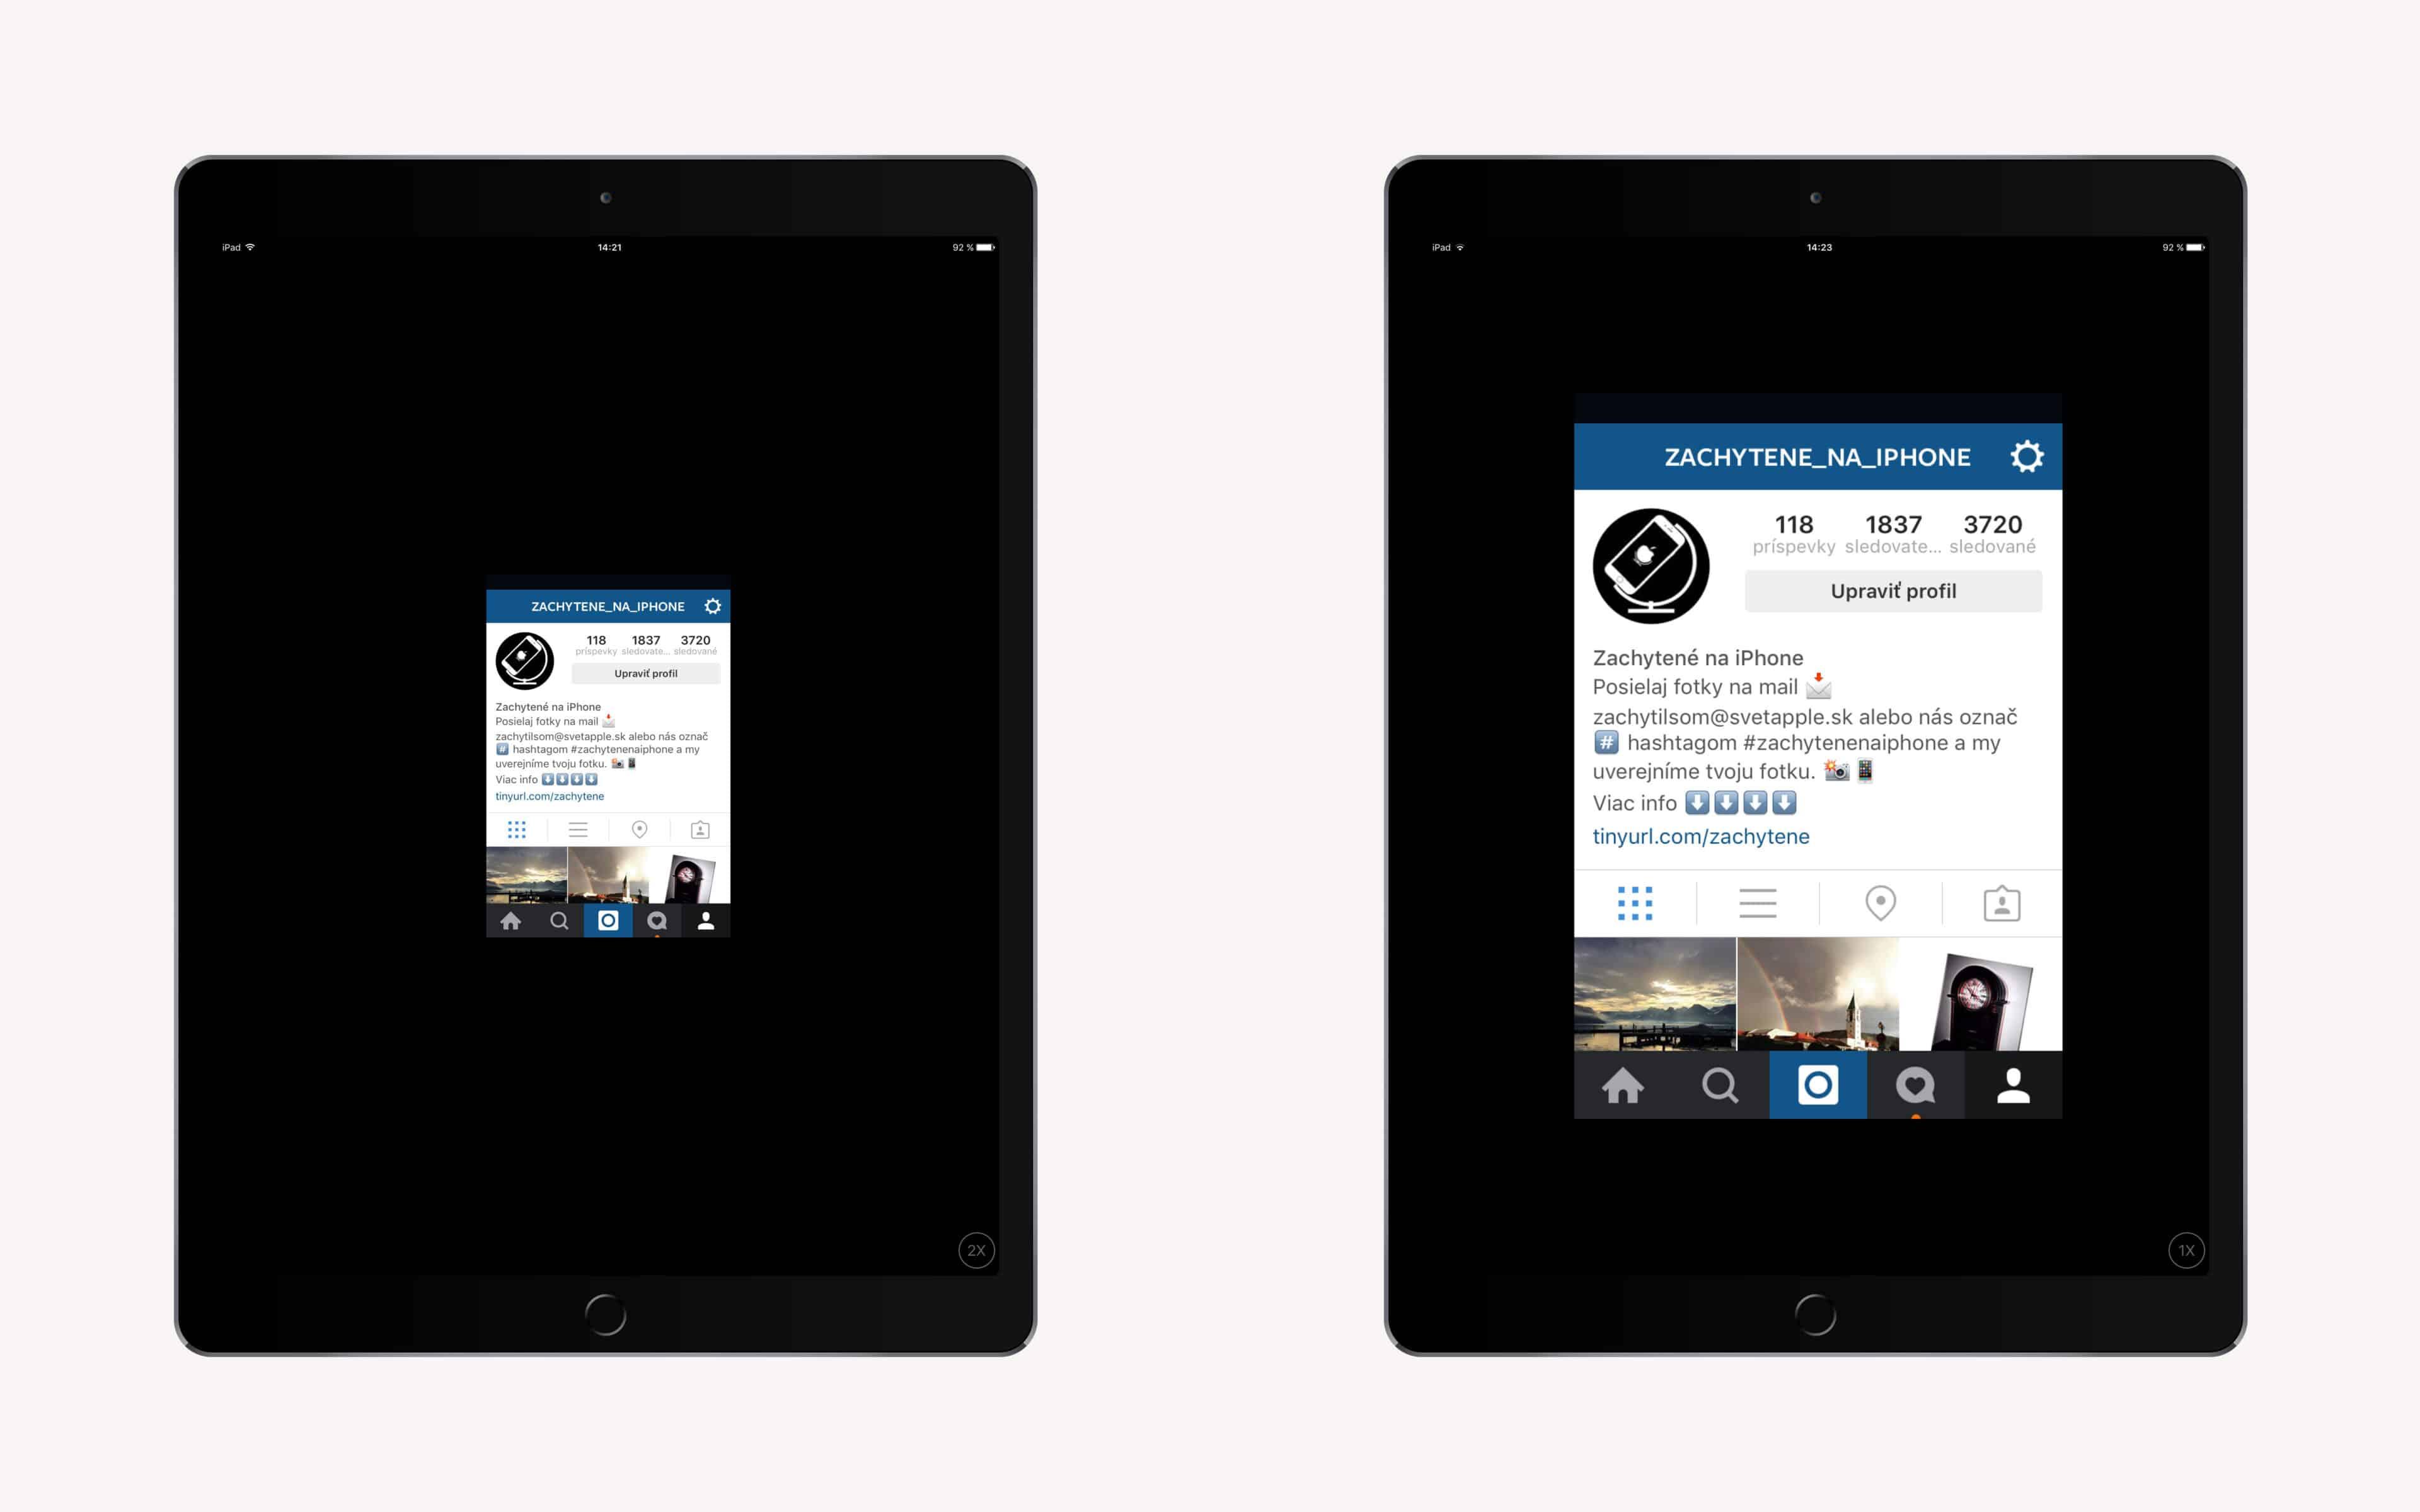 Instagram---iPad-Pro-SvetApple